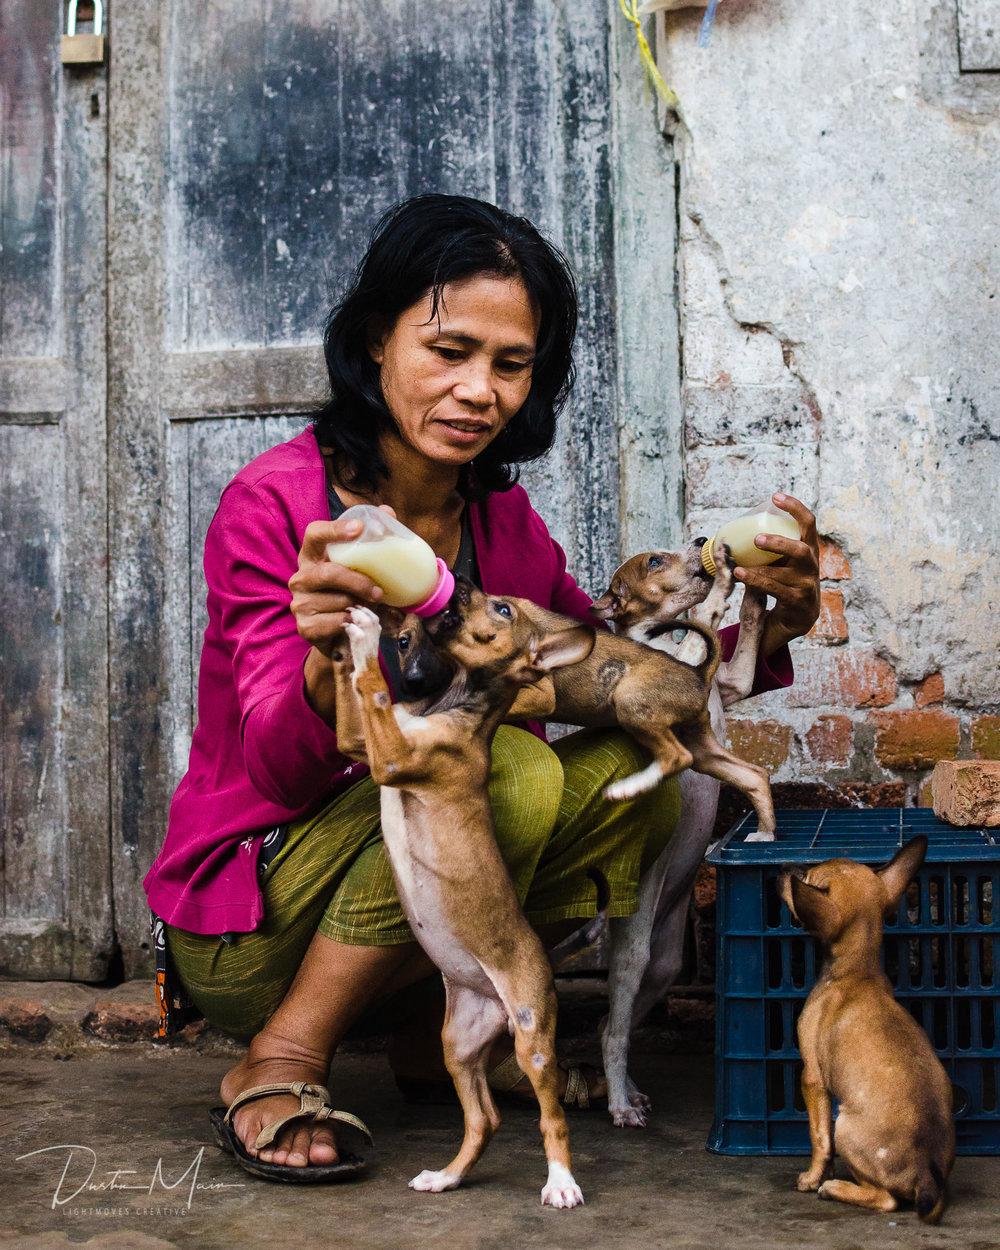 Daw Tin Tin Hla cares for 4 puppies near her home in Mawlamyine. © Dustin Main 2014